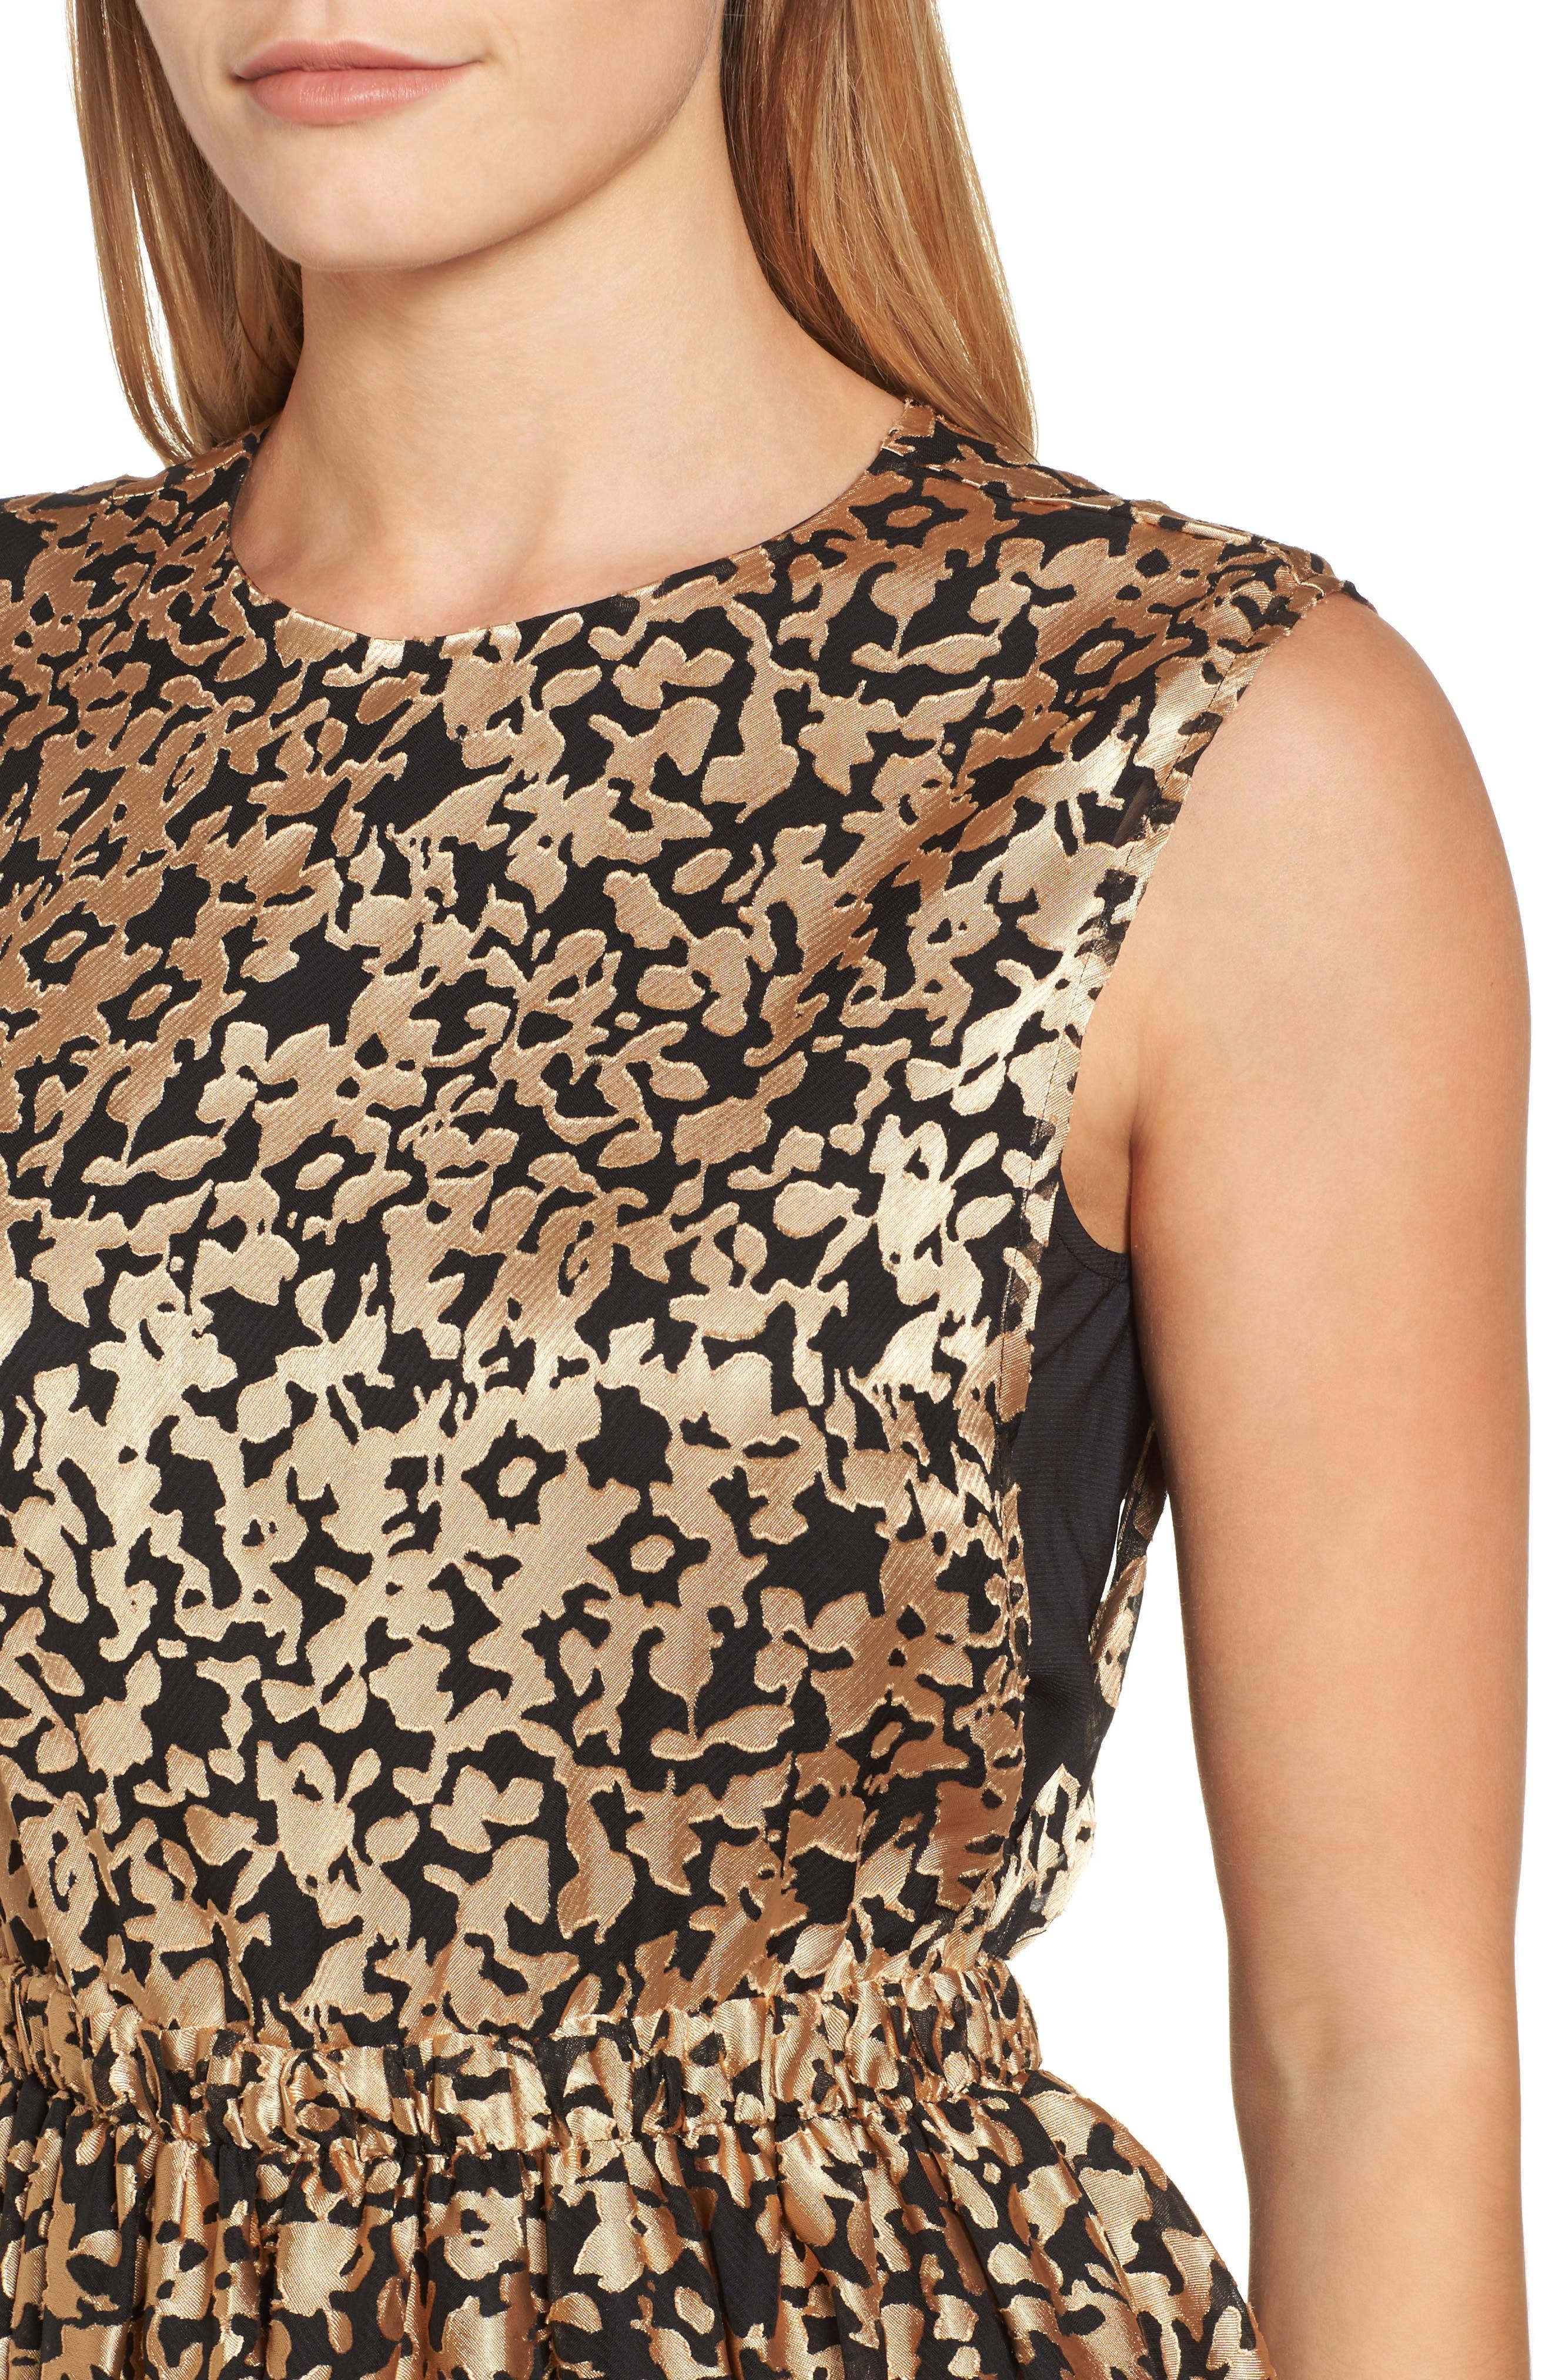 Kells Metallic Fit & Flare Dress,                             Alternate thumbnail 4, color,                             Gold/ Black